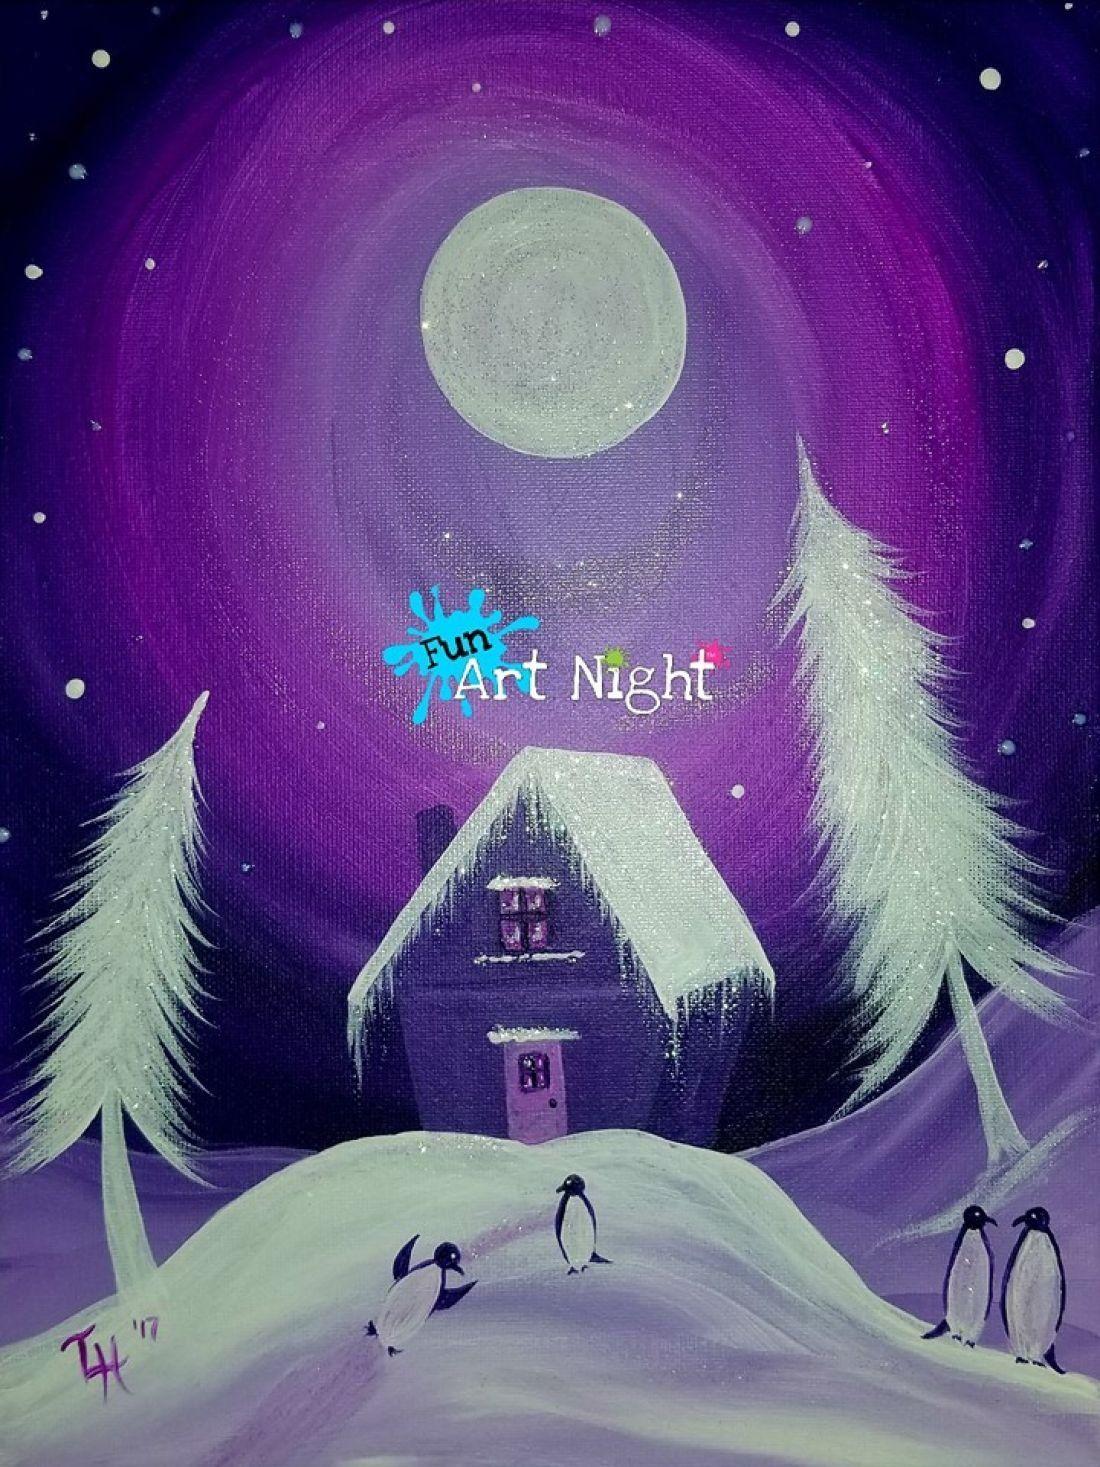 Fun Art Night Moonlit Merriment in Waynesboro